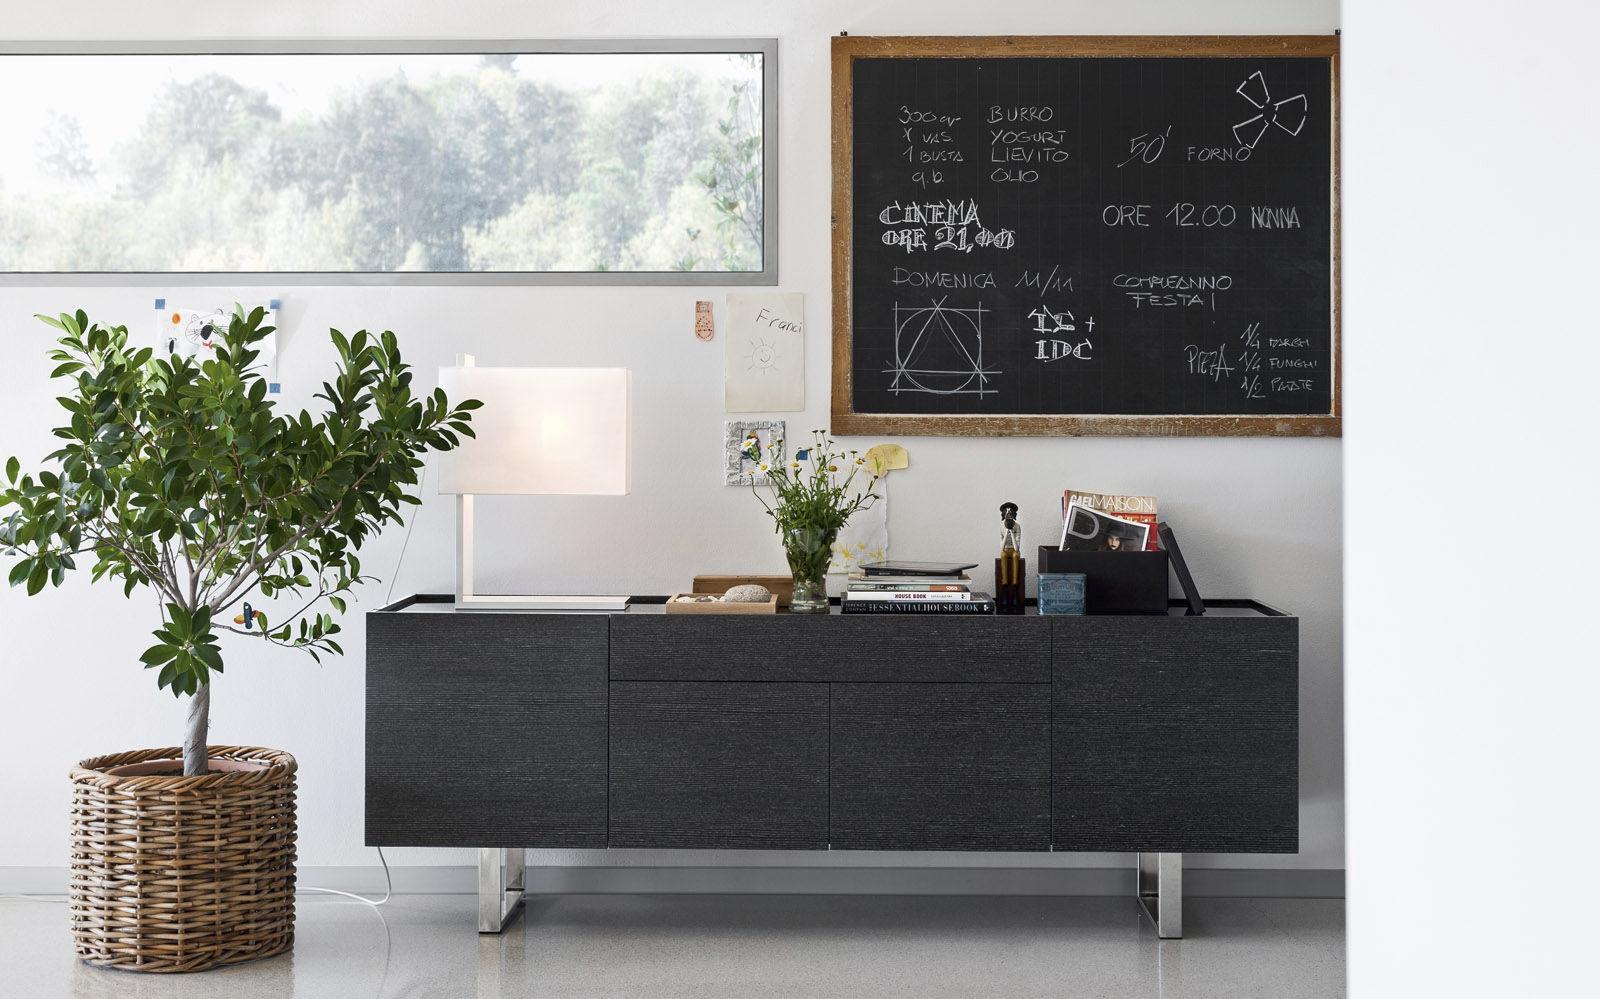 Credenza Moderna Calligaris : Credenza moderna in legno con rivestimento vetro temperato